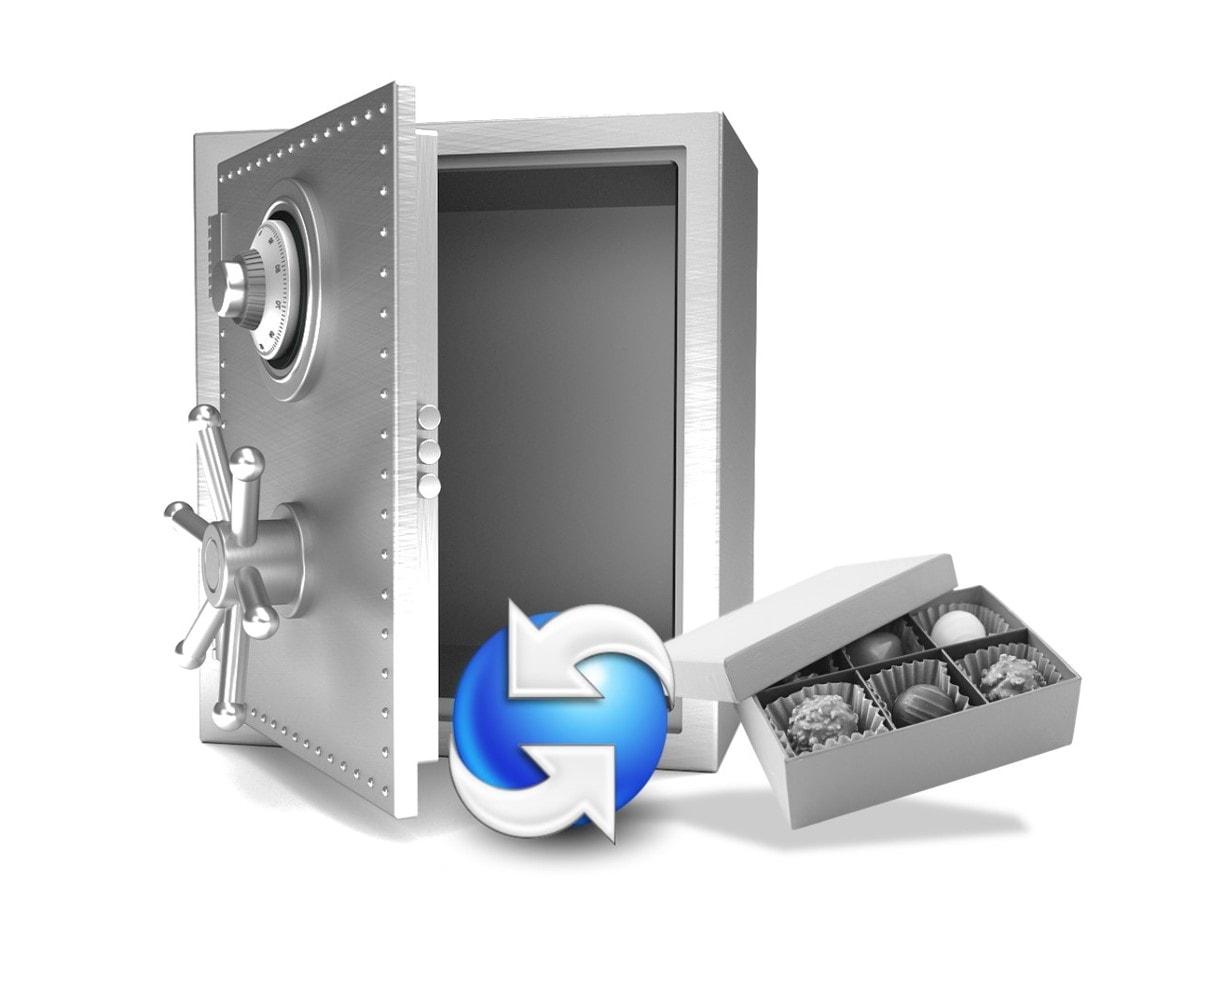 Kühlschrank Tresor : Kühlschrankbox kühlschrankschloß fridge food safe kühlschrank